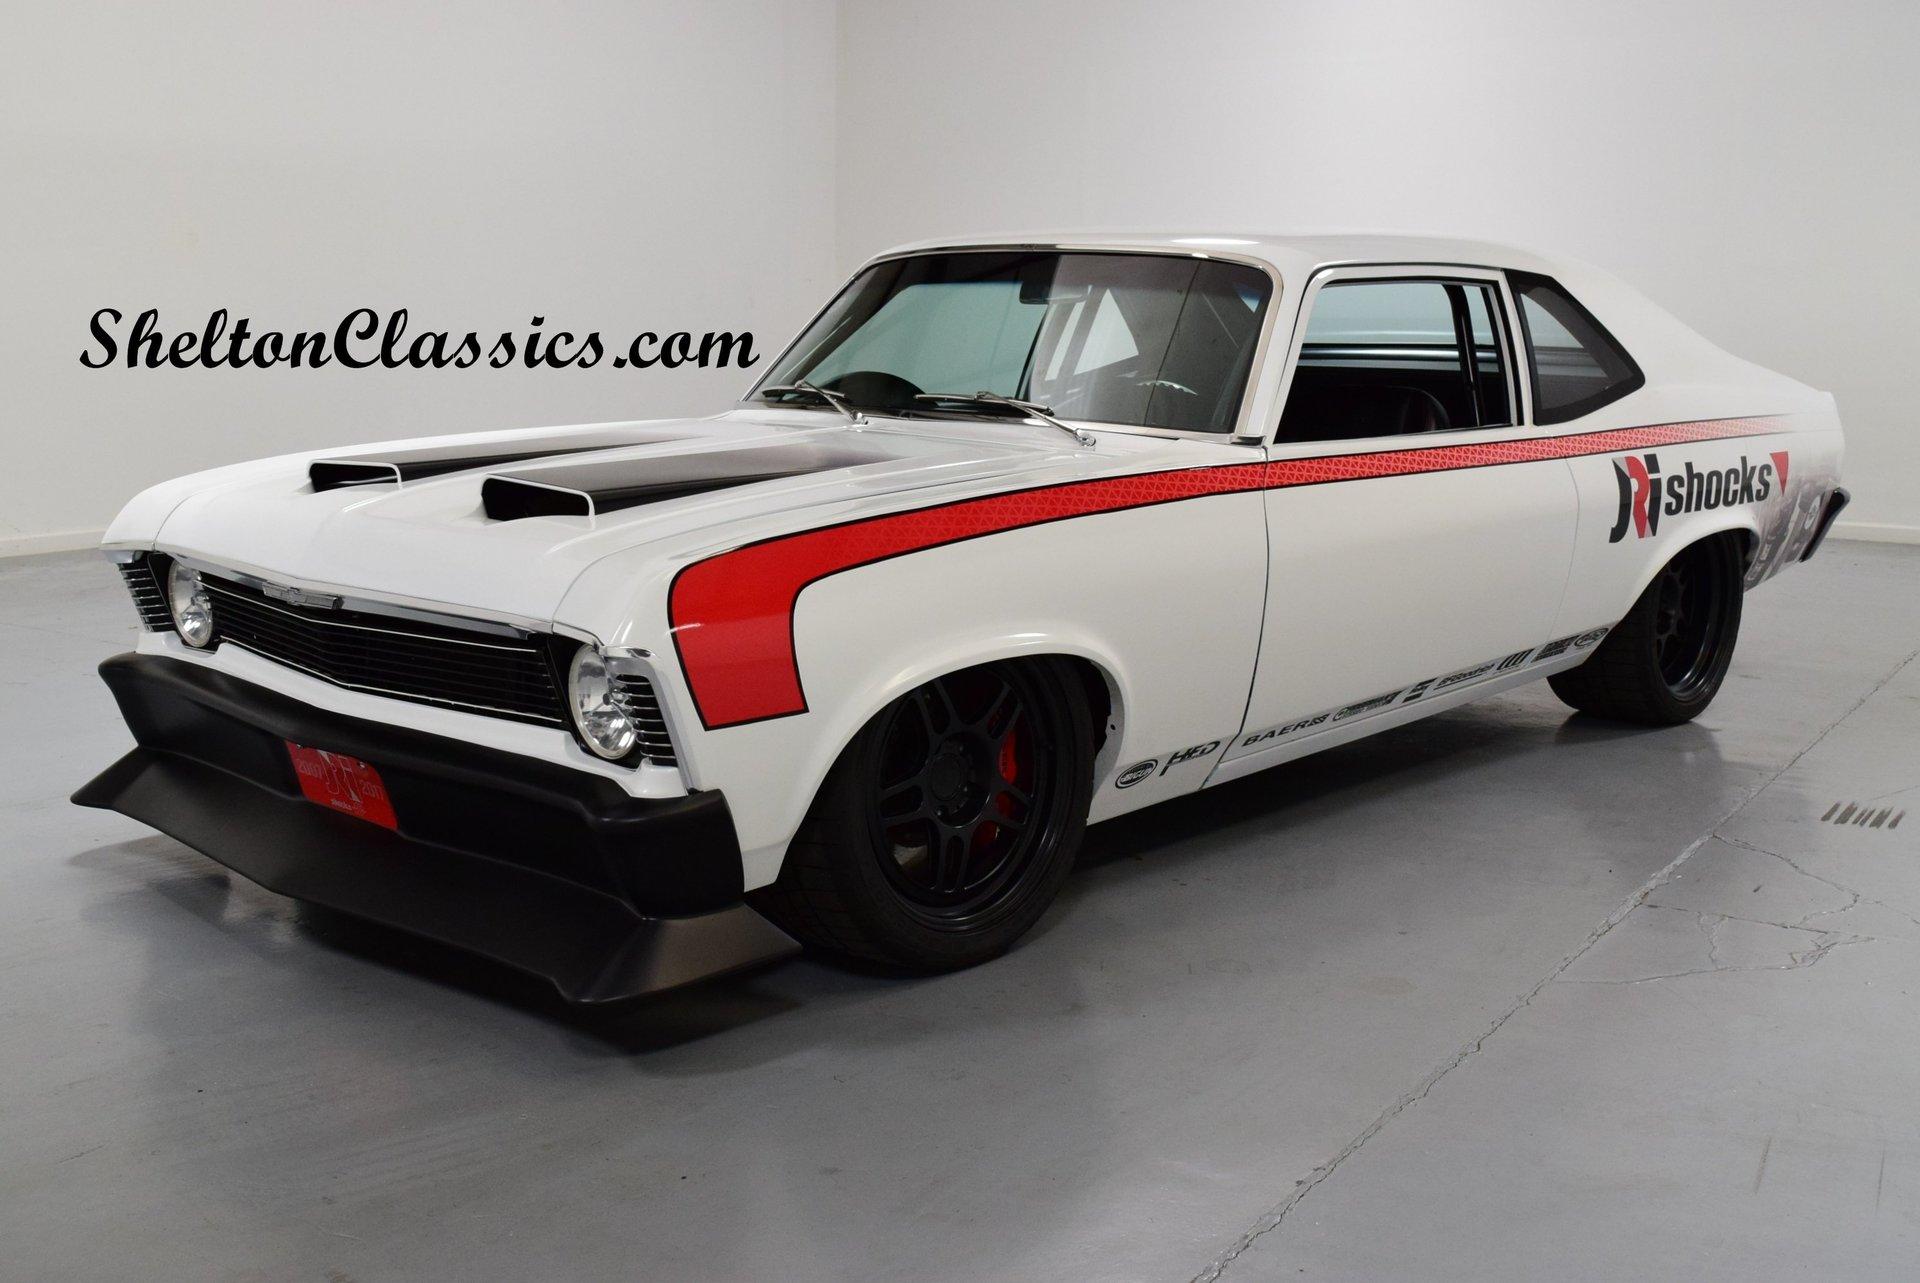 1970 Chevrolet Nova Shelton Classics